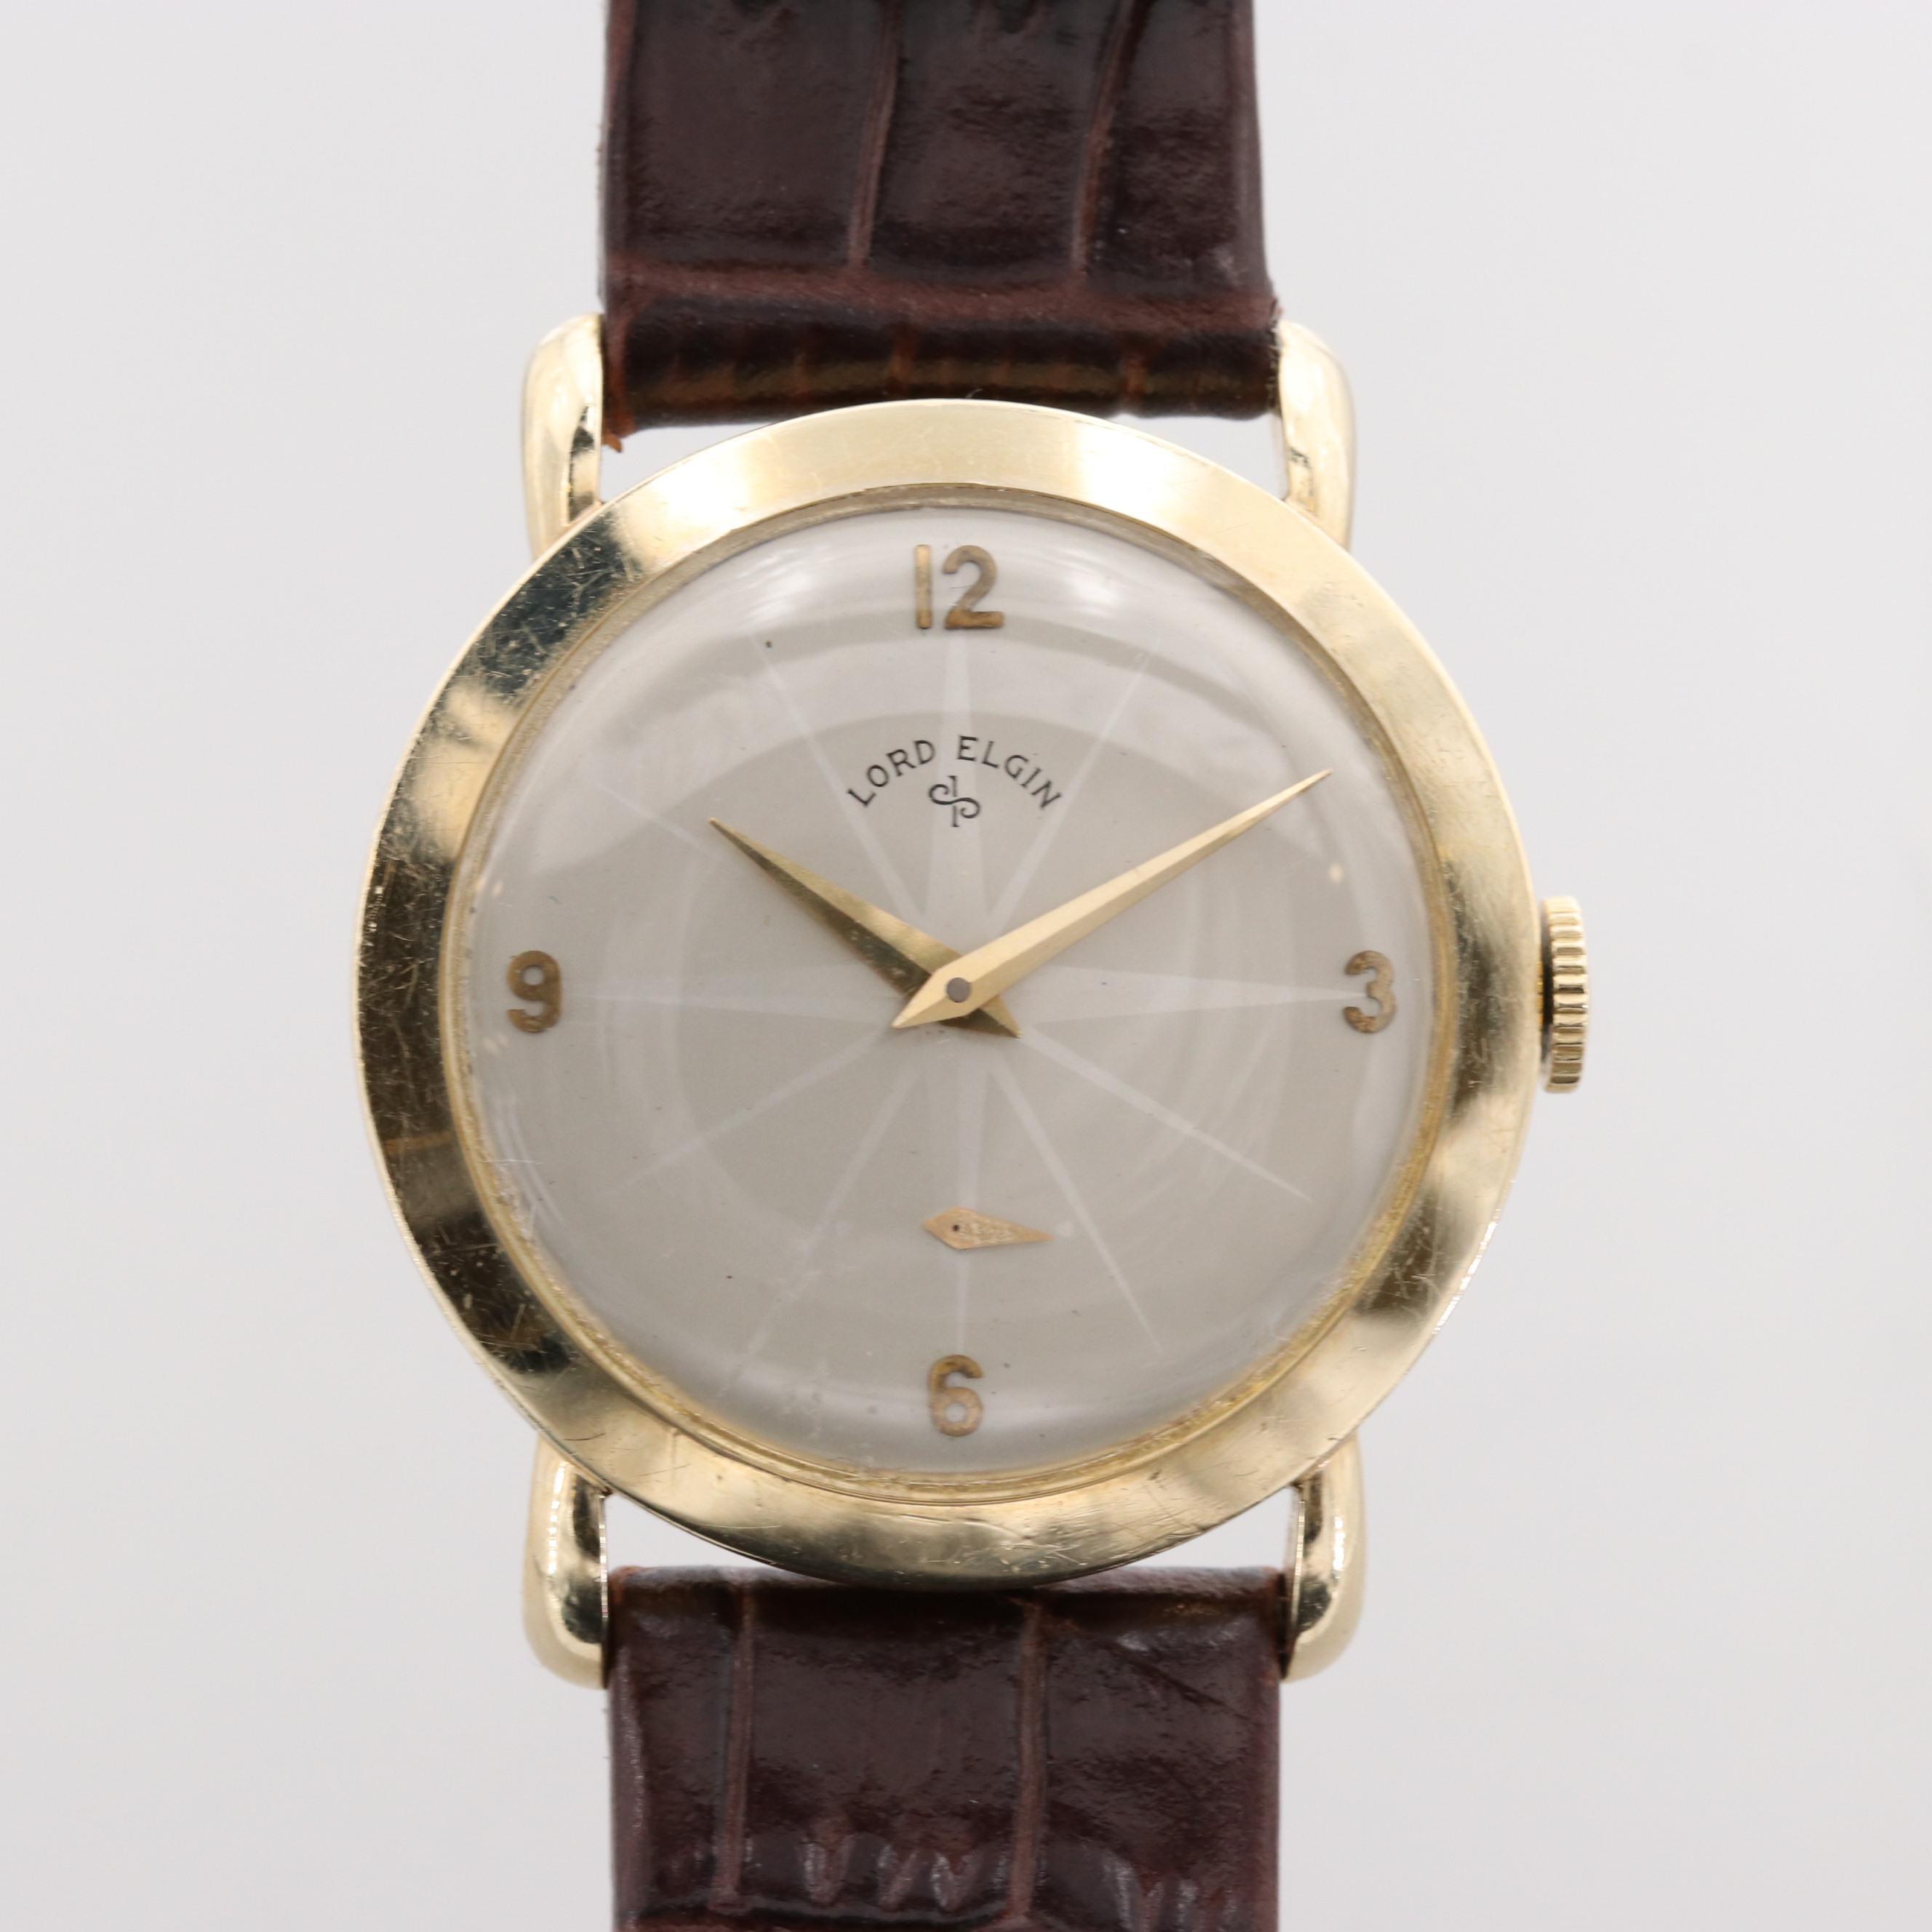 Lord Elgin 14K Yellow Gold Wristwatch, Circa 1952